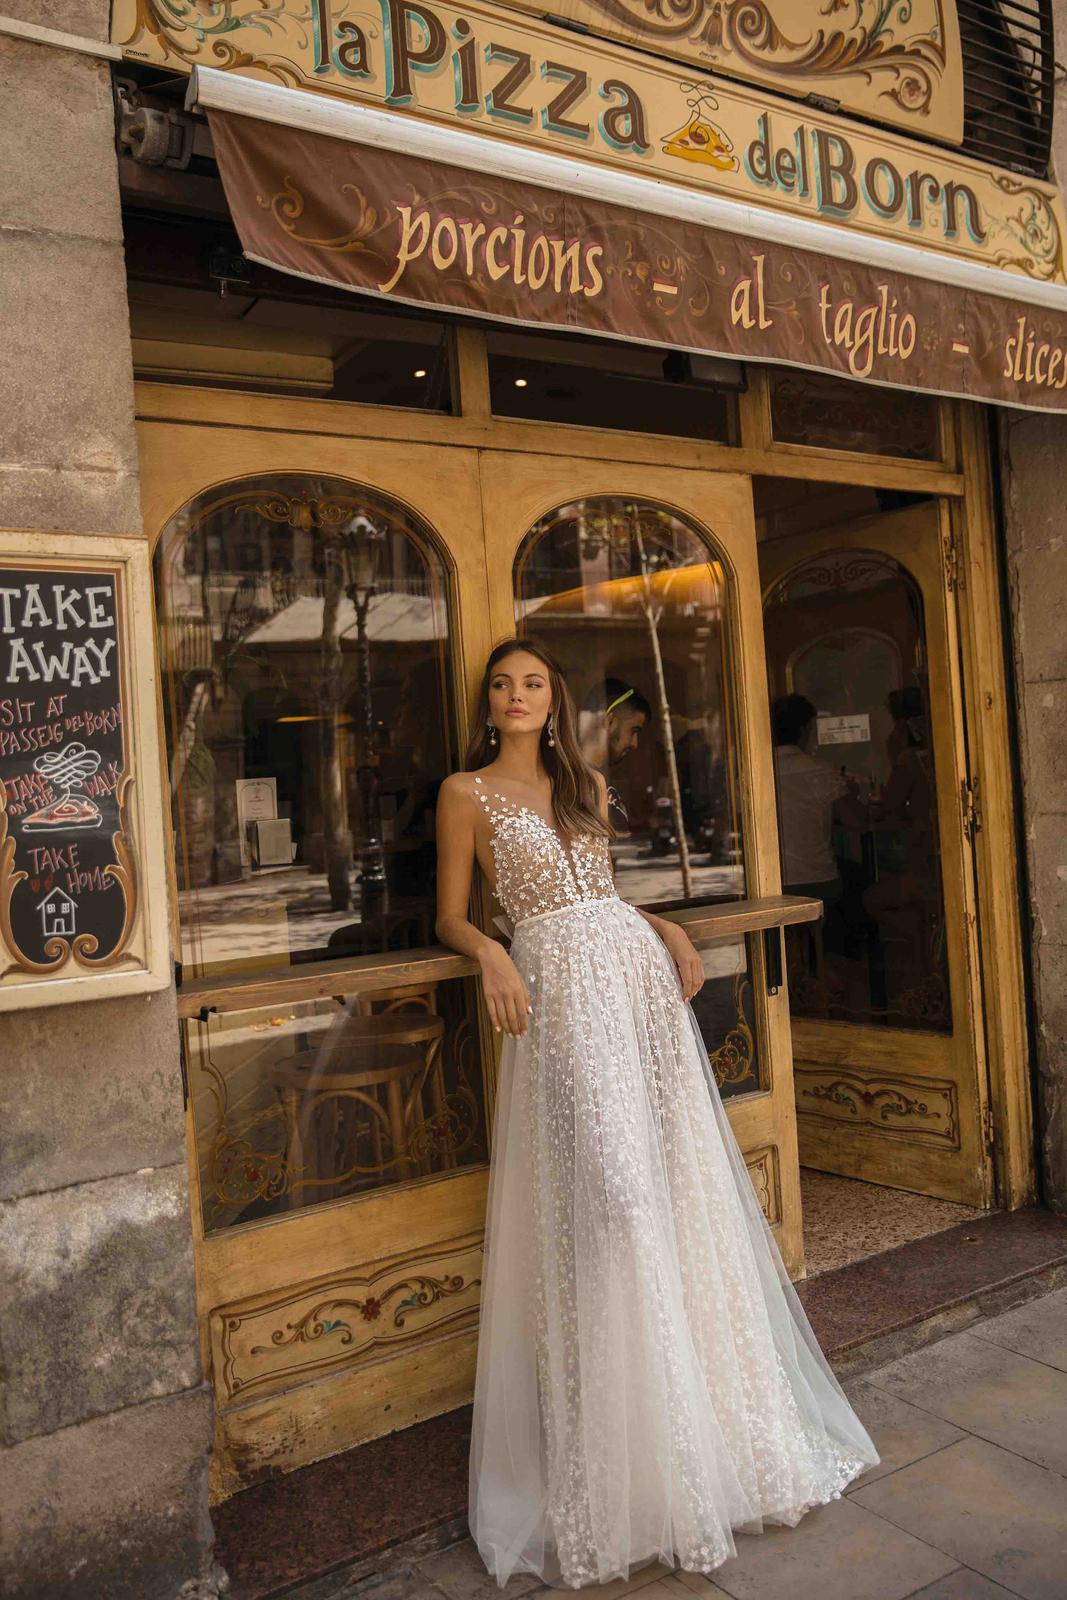 Muse by Berta * Svadobné šaty z kolekcií na rok 2019 - Obrázok č. 17